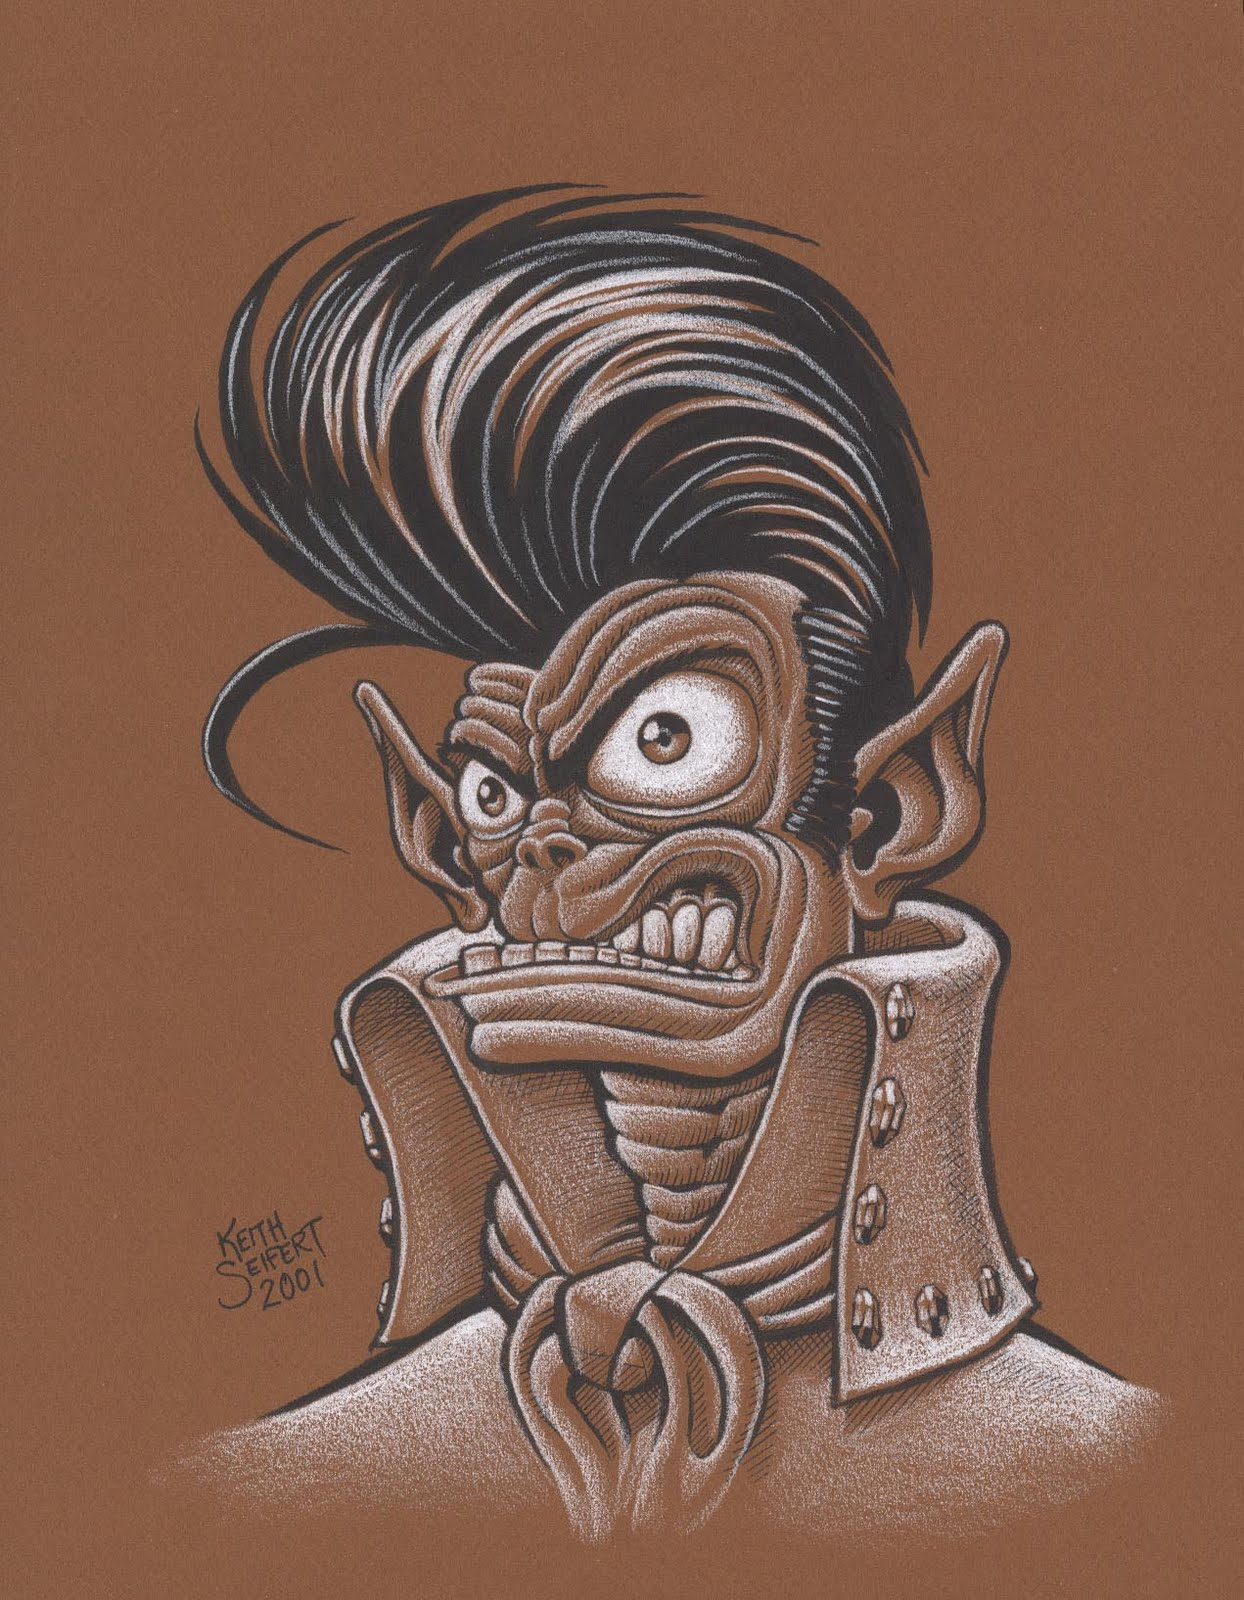 KW Monsters Blog of Evil: PENCIL DRAWINGS AGAIN?!